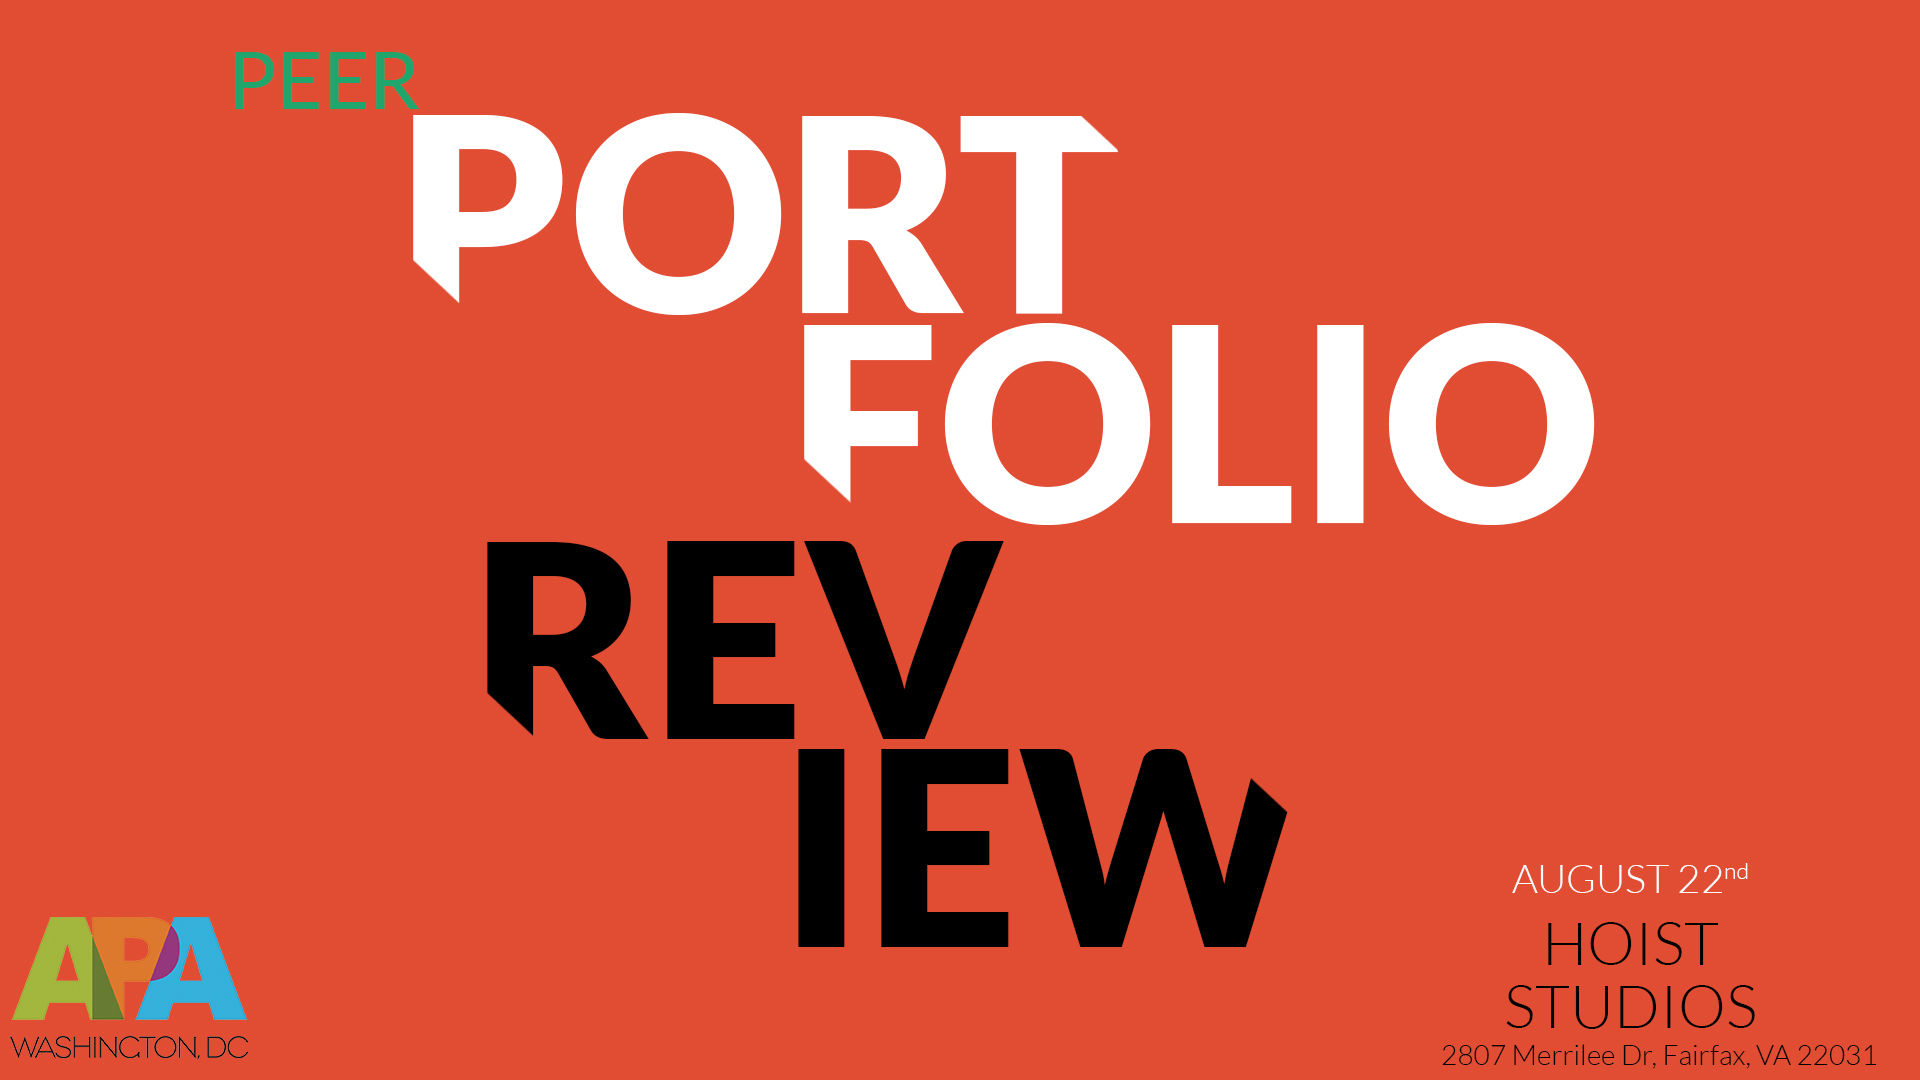 Peer_Website_Portfolio Review.jpg